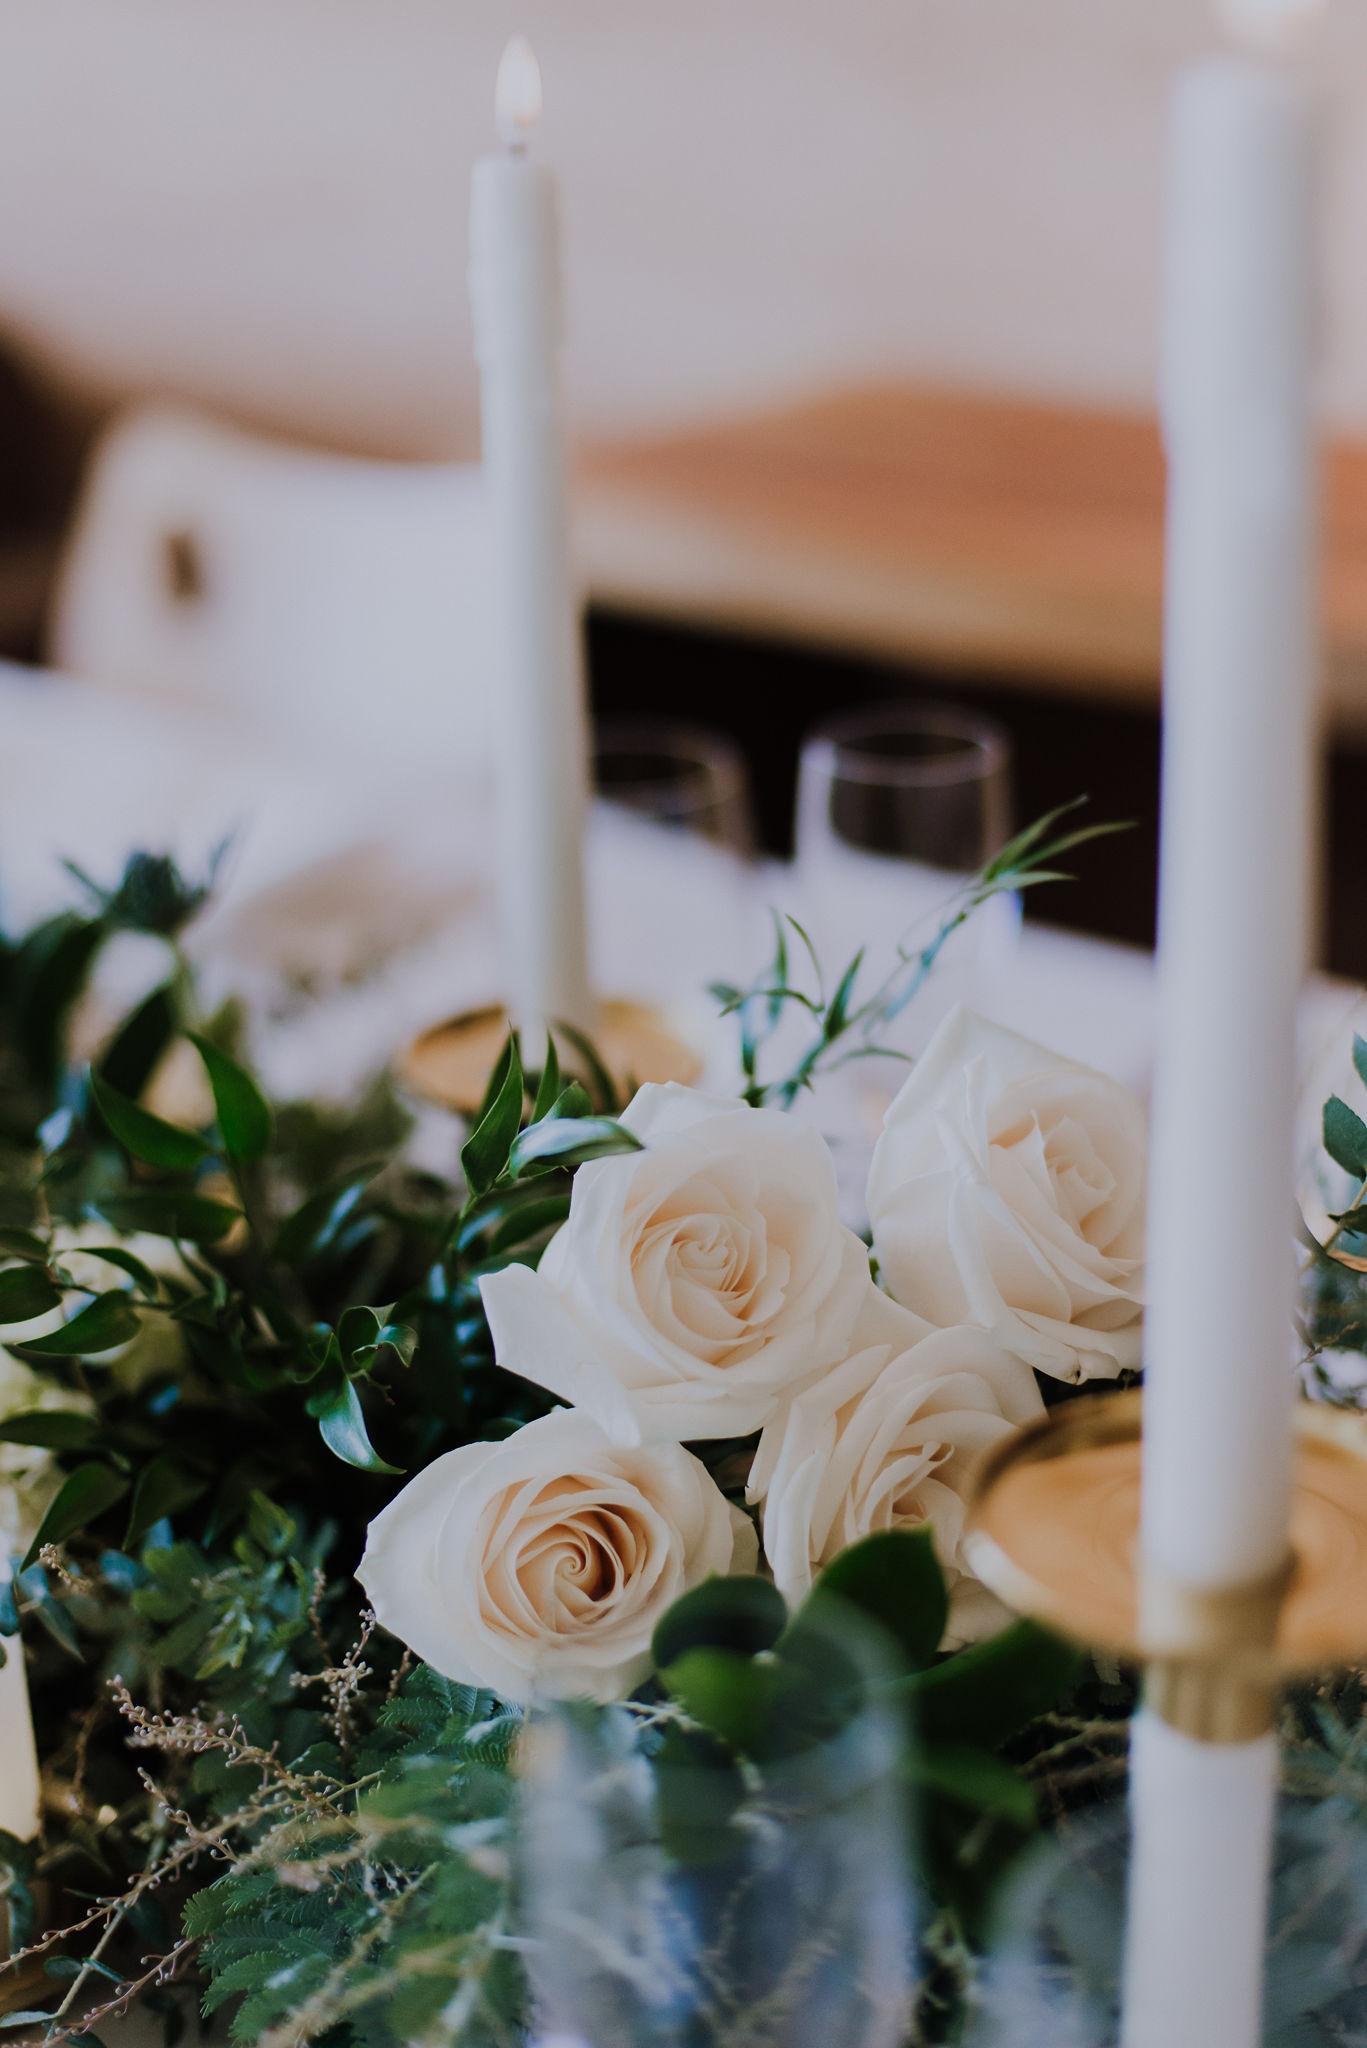 saltandsandeventhire-wedding-stylist-exmouth-ningaloo-wa-R&O-Elopement-Renaeharveyphotograpy-2.jpg